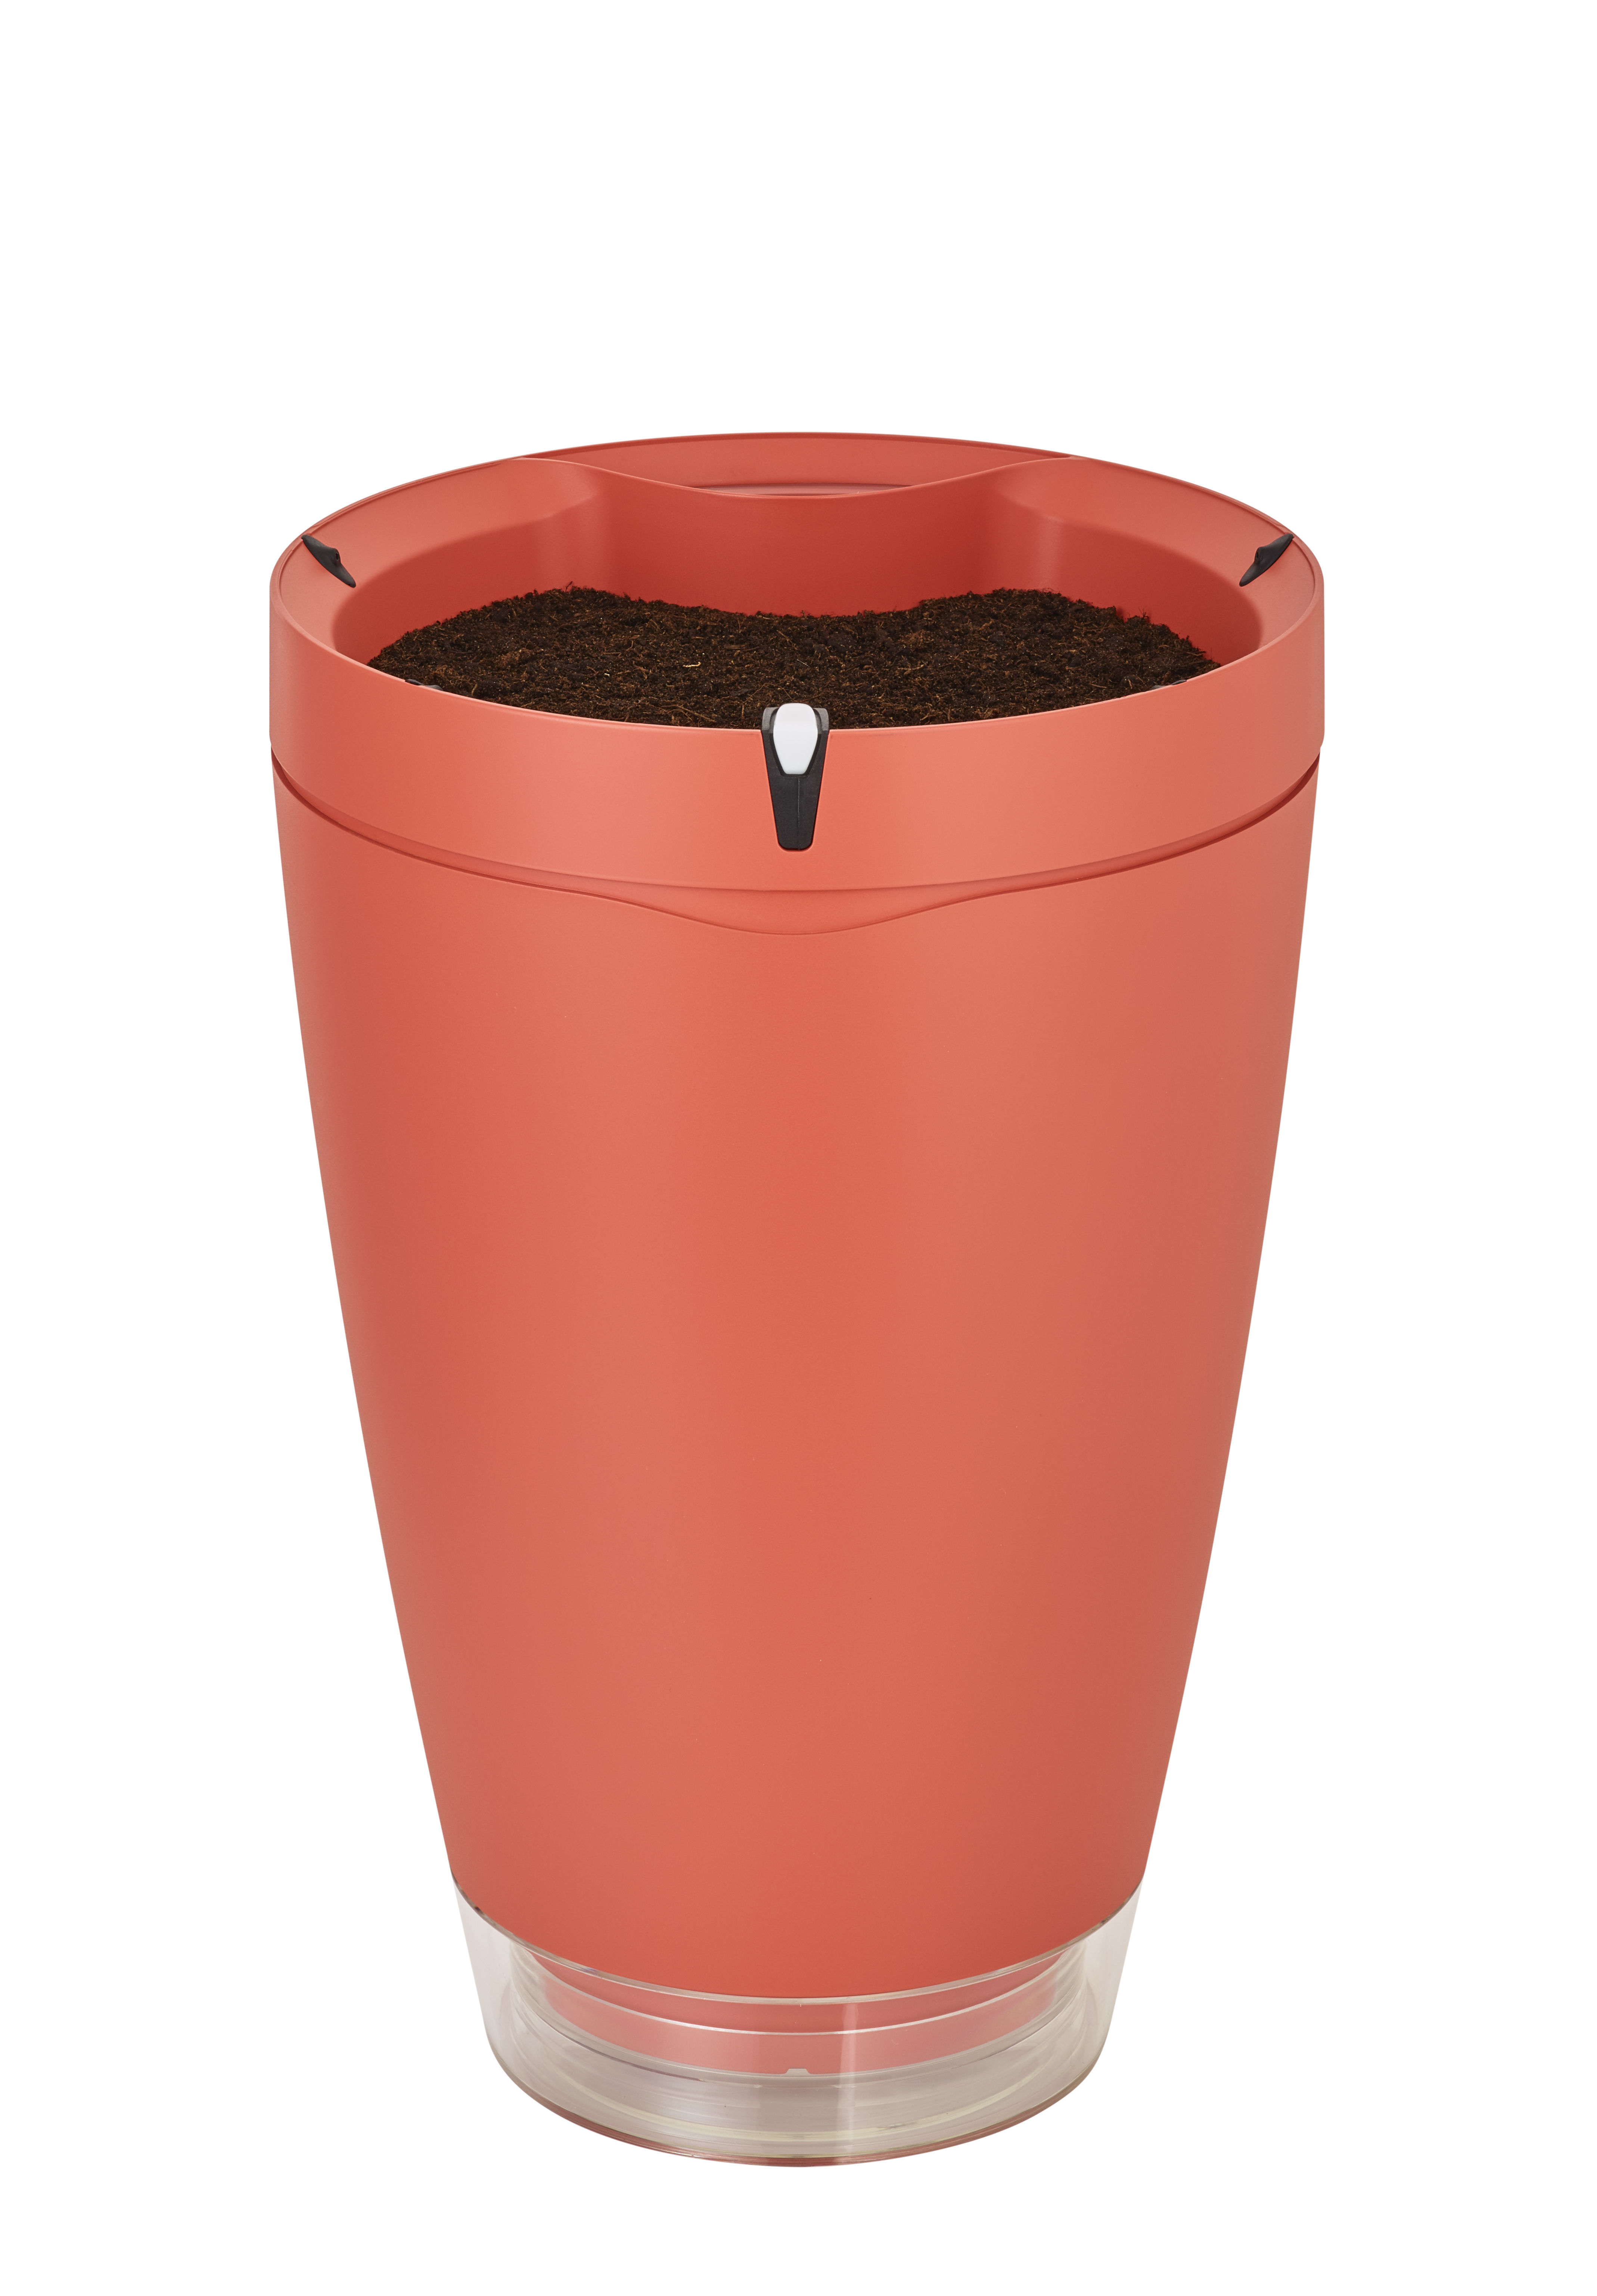 Pot - Brique